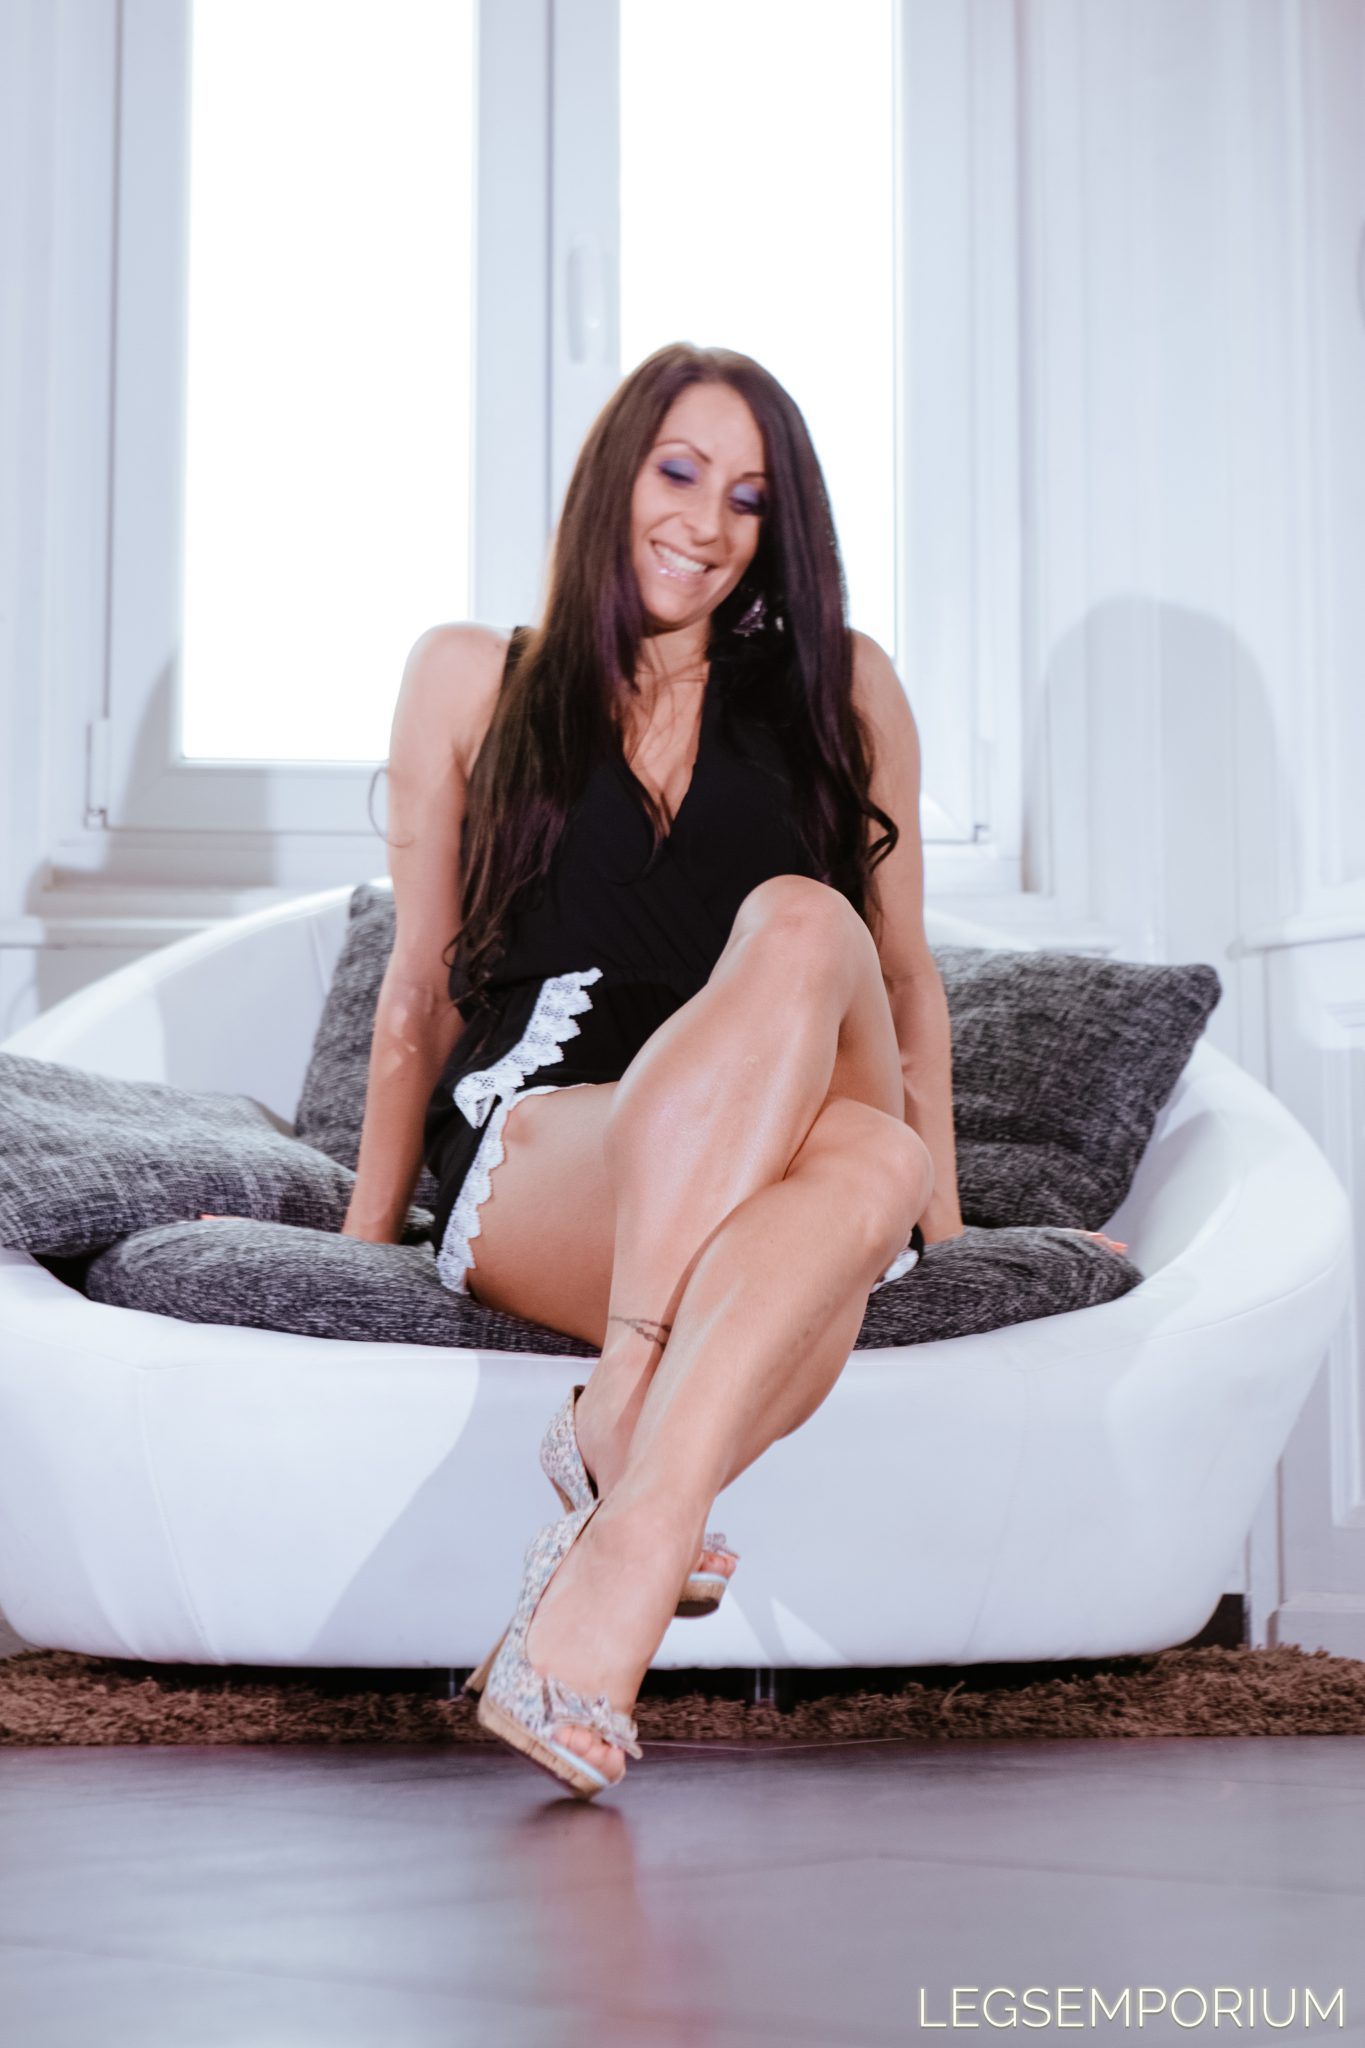 Emily - Escorts - High Class Agency Models, Adult Escort